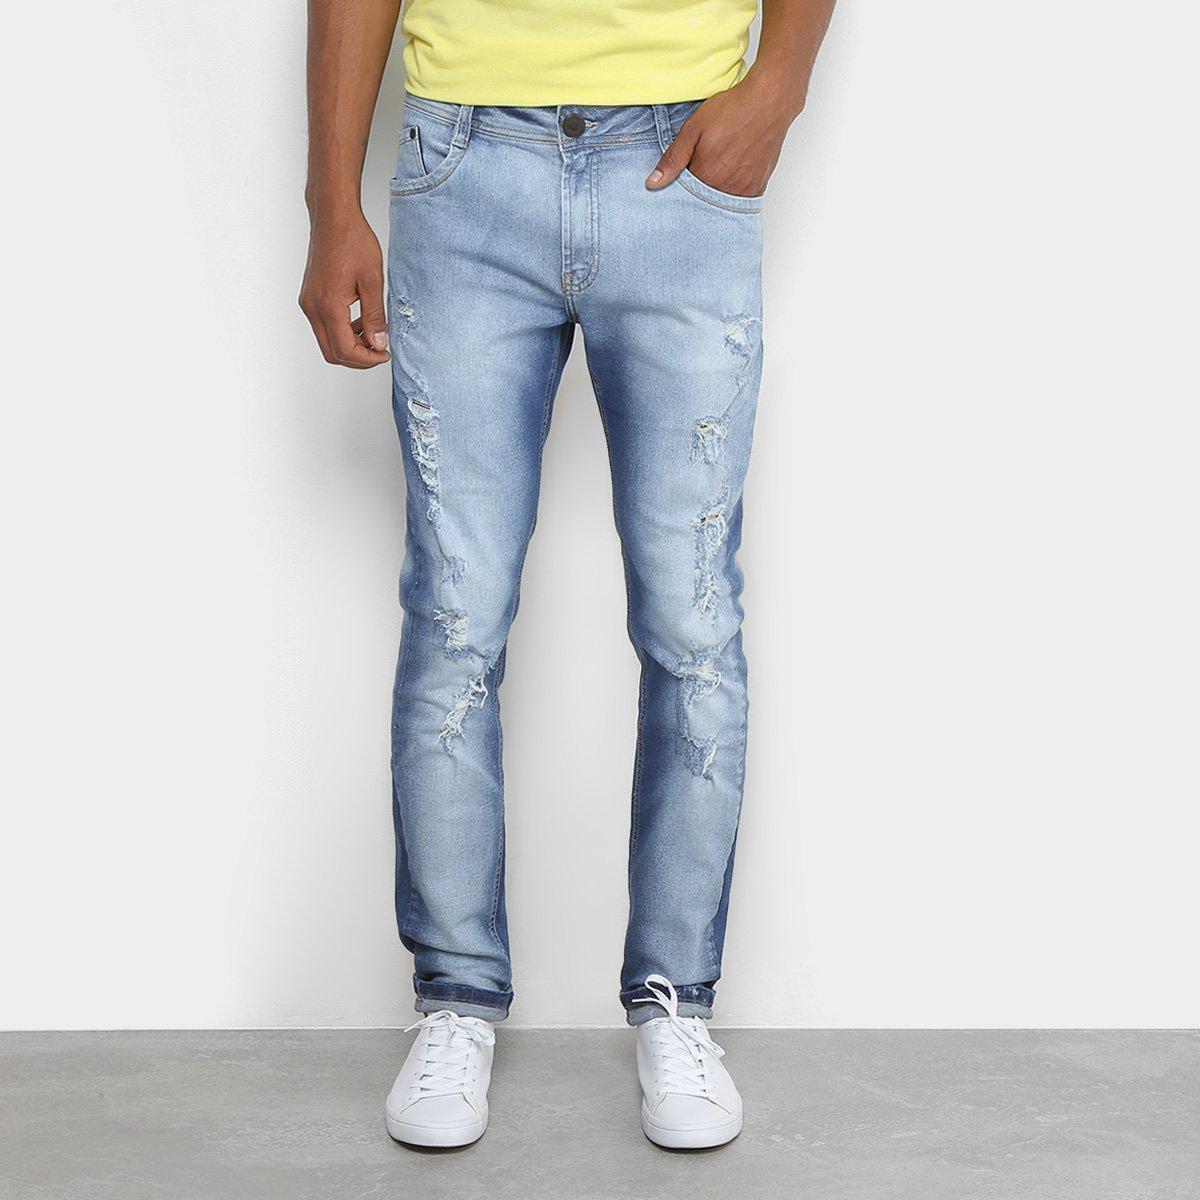 4ed40adb0e Calça Jeans Skinny Dimy Puídos Masculina